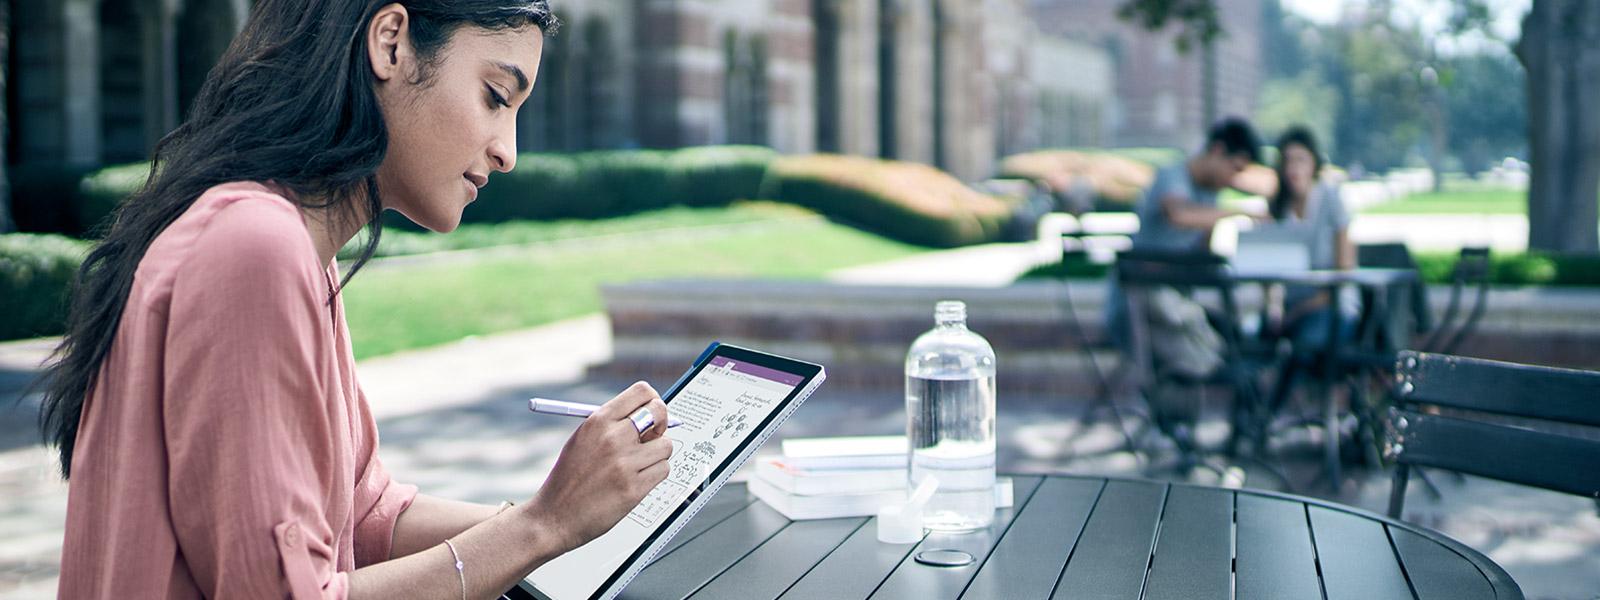 Mujer sentada afuera, usando la pantalla táctil de Surface Pro 4 en modo de tableta.